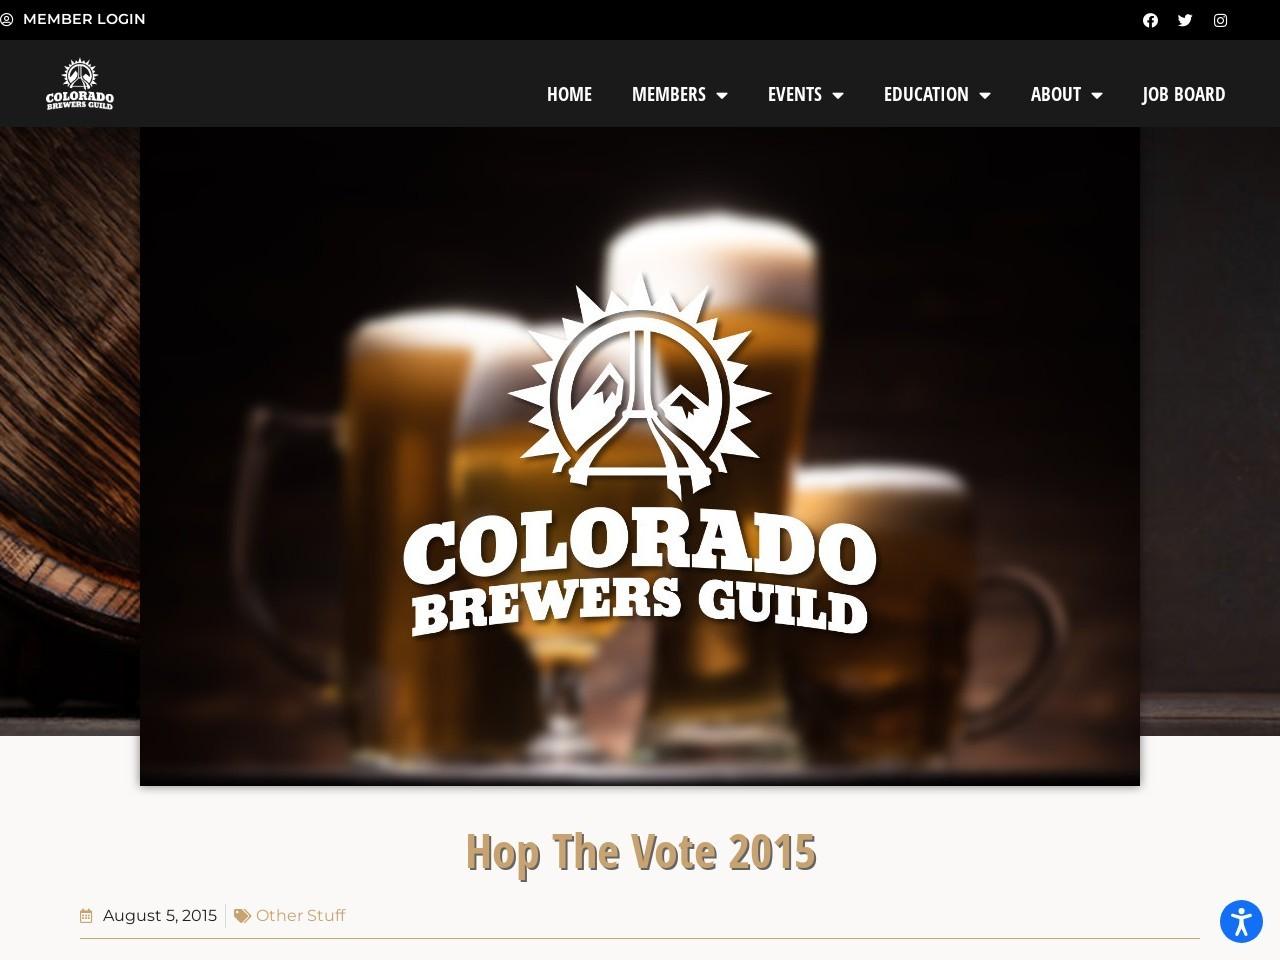 Hop The Vote 2015